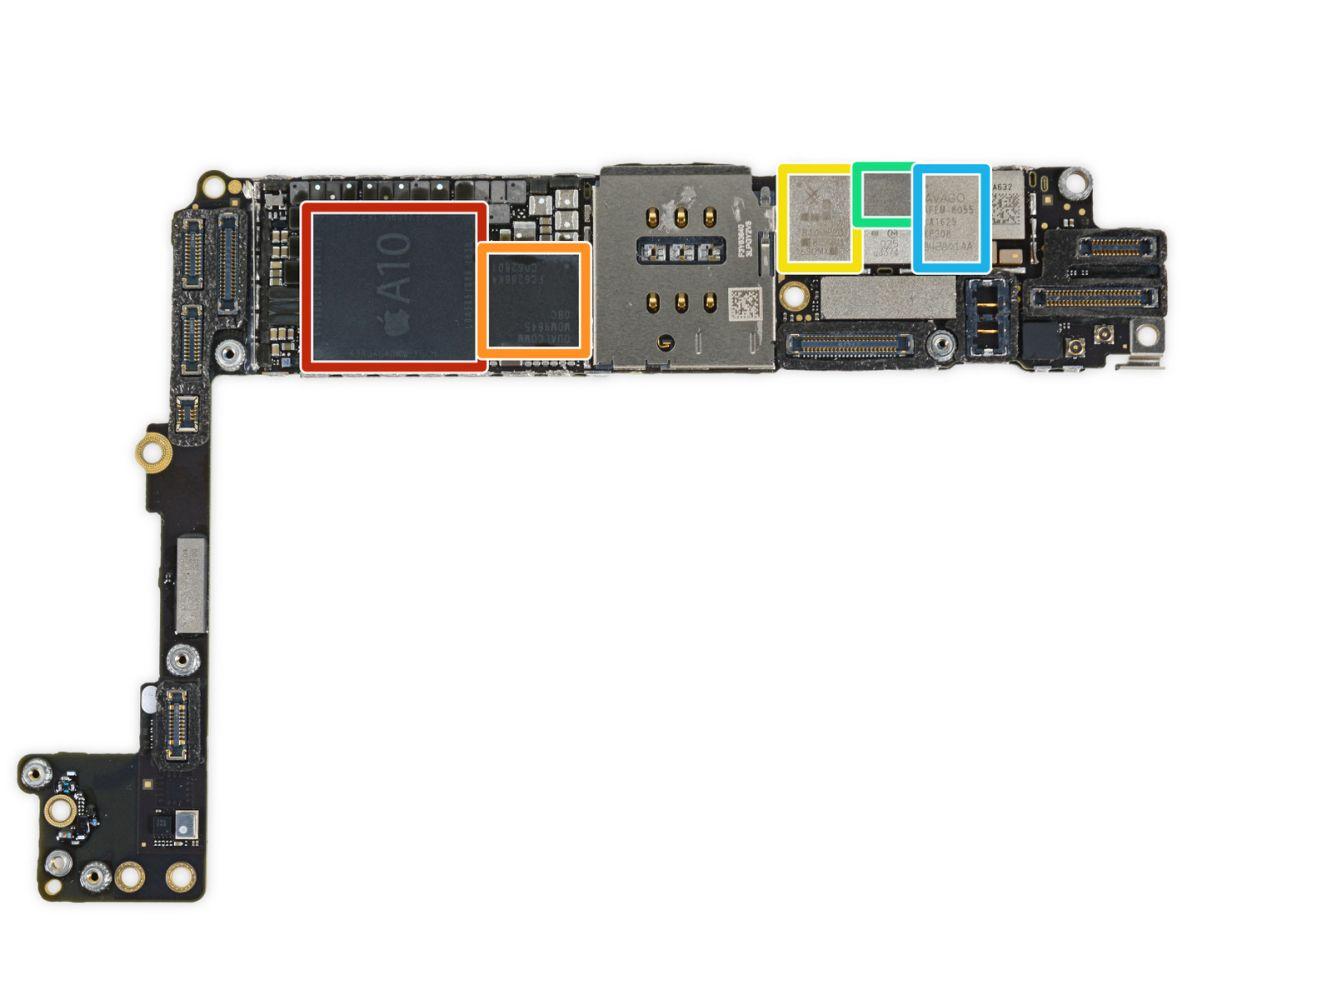 IPhone 7 teardown confirms Apple put Intel inside